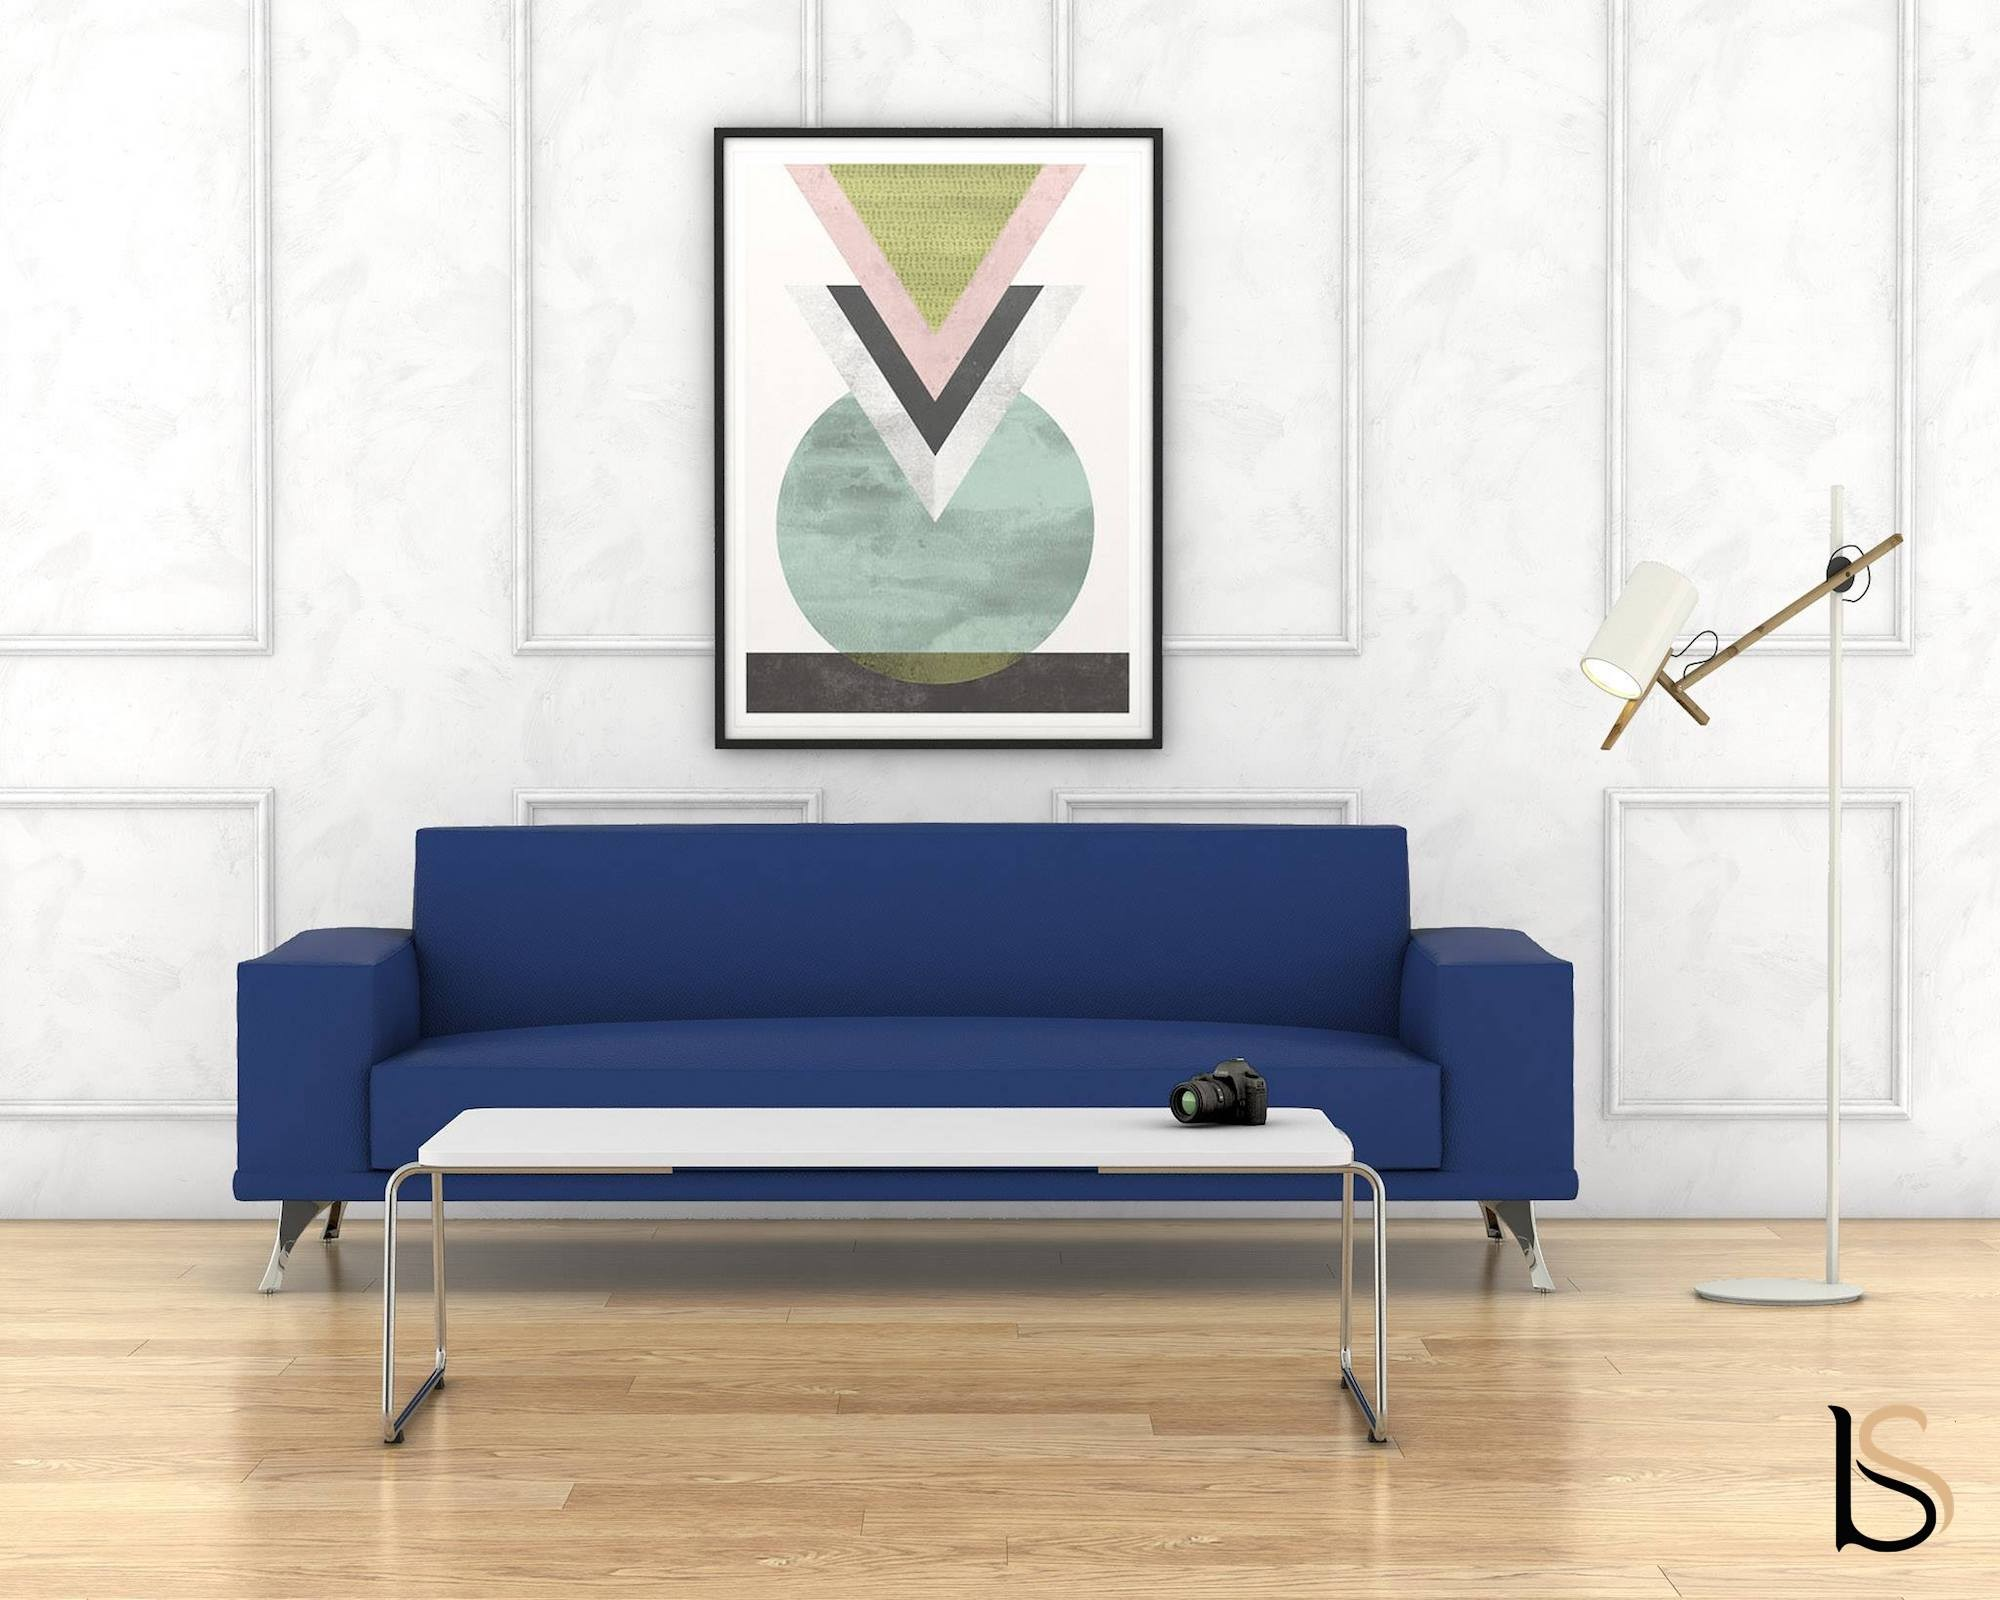 canap d attente 3 places sf mobel linea canap s d 39 accueil mobel. Black Bedroom Furniture Sets. Home Design Ideas